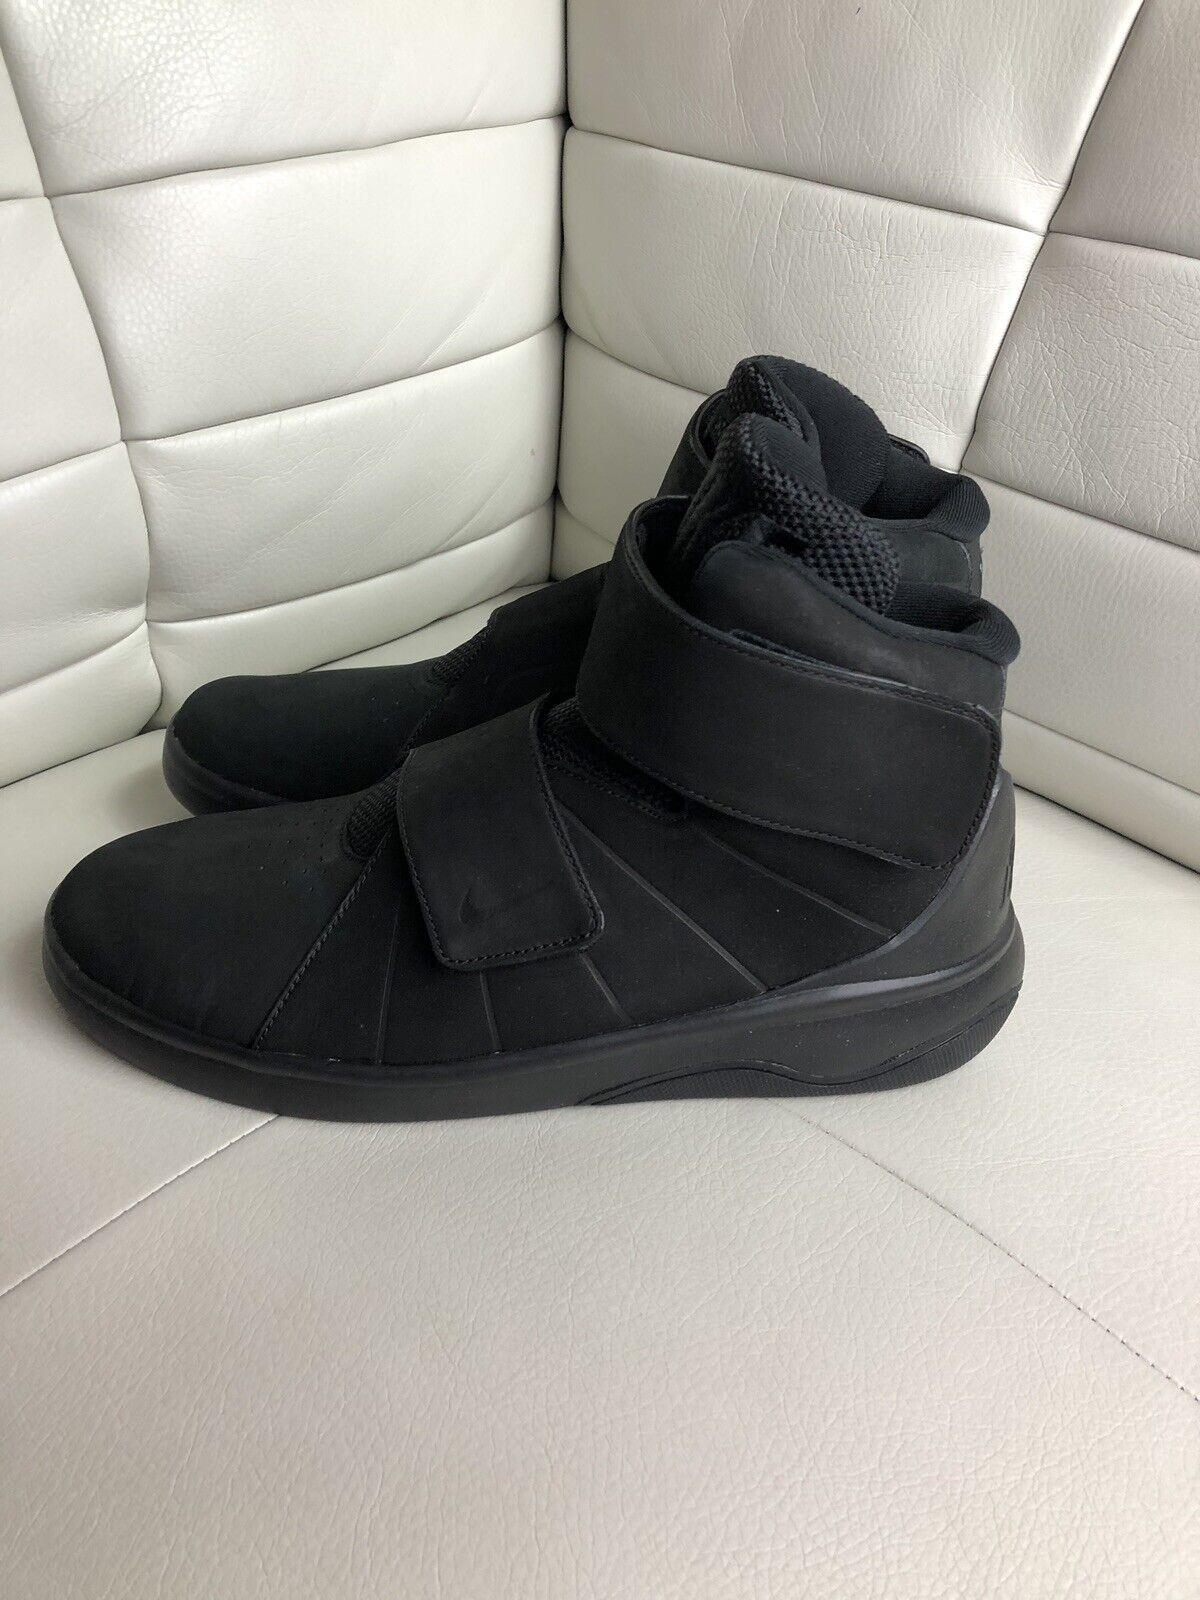 Nike Marxman Premium Black Size 12